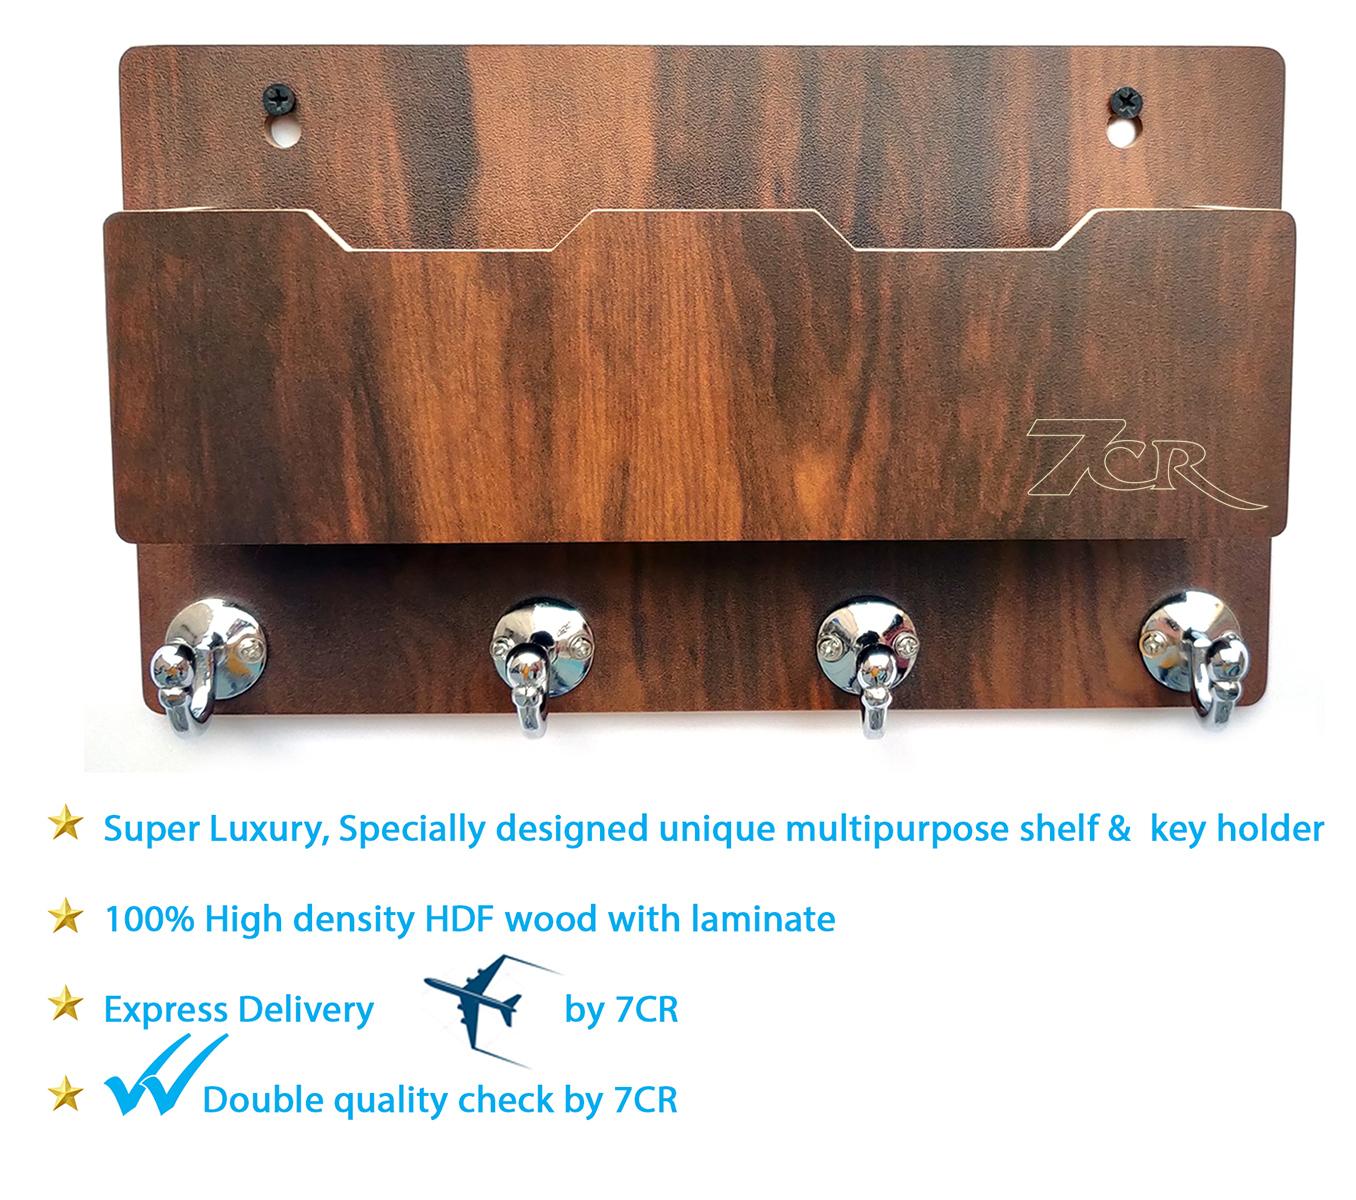 Specially Designed Key Holder